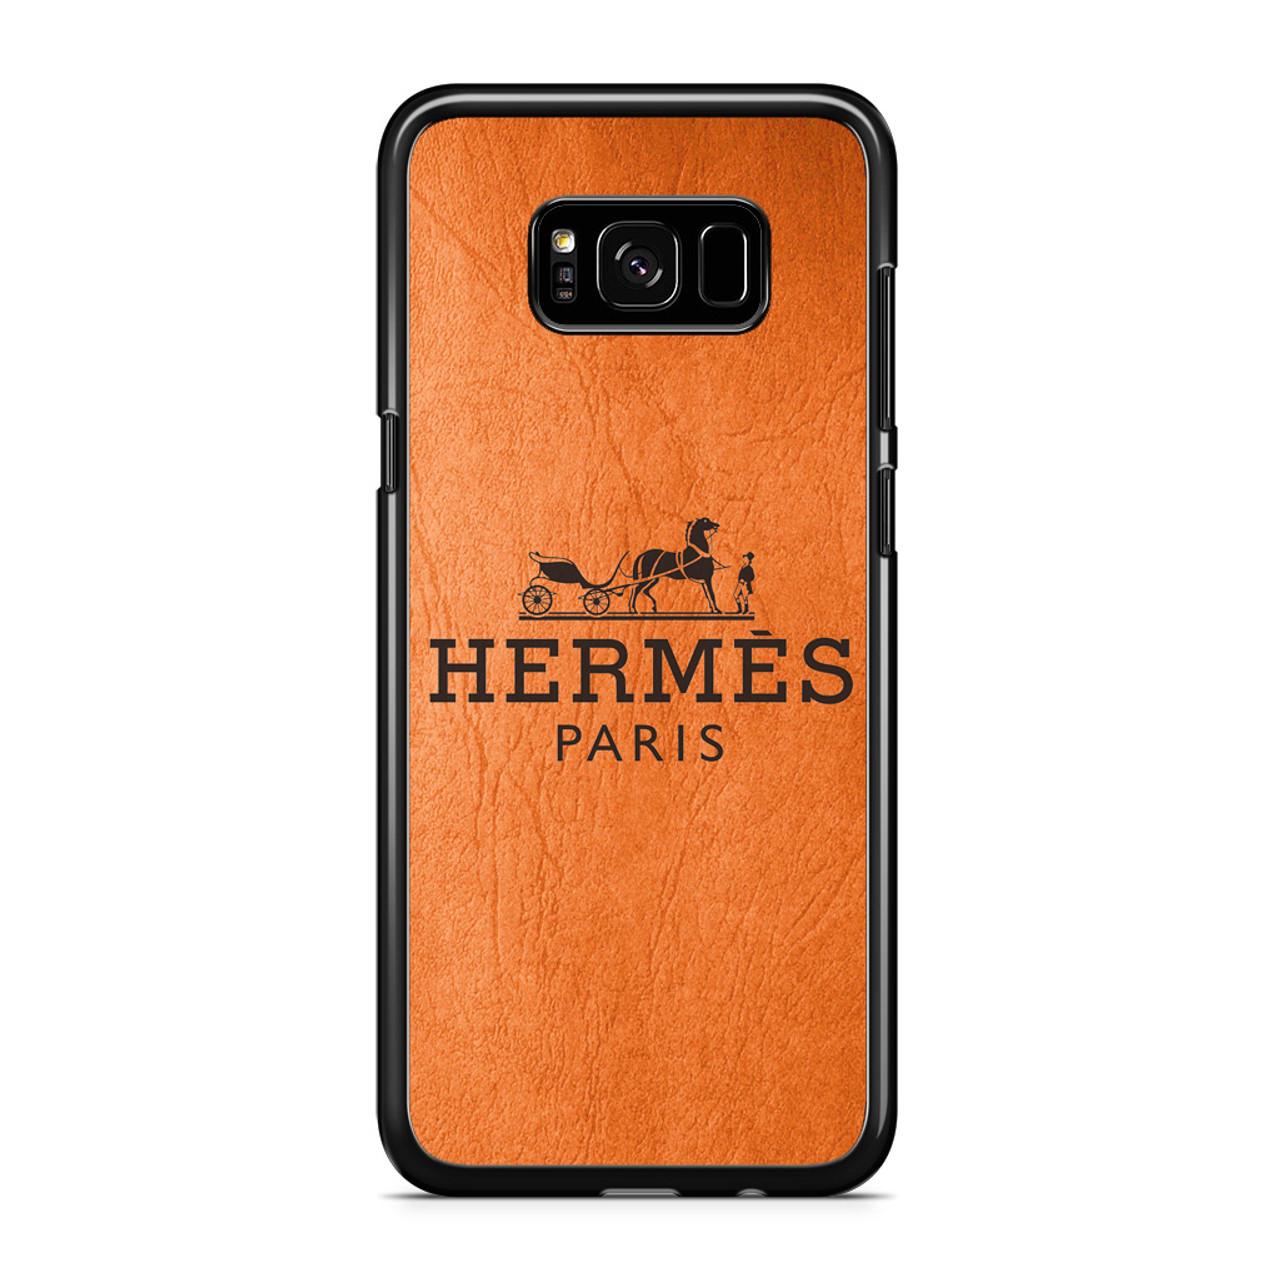 hermes paris samsung galaxy s8 case caseshunterBest Samsung Galaxy S8 Case Best Case For S8 Galaxy Casing Samsung S8 Samsung Galaxy S8 S Hermes #1